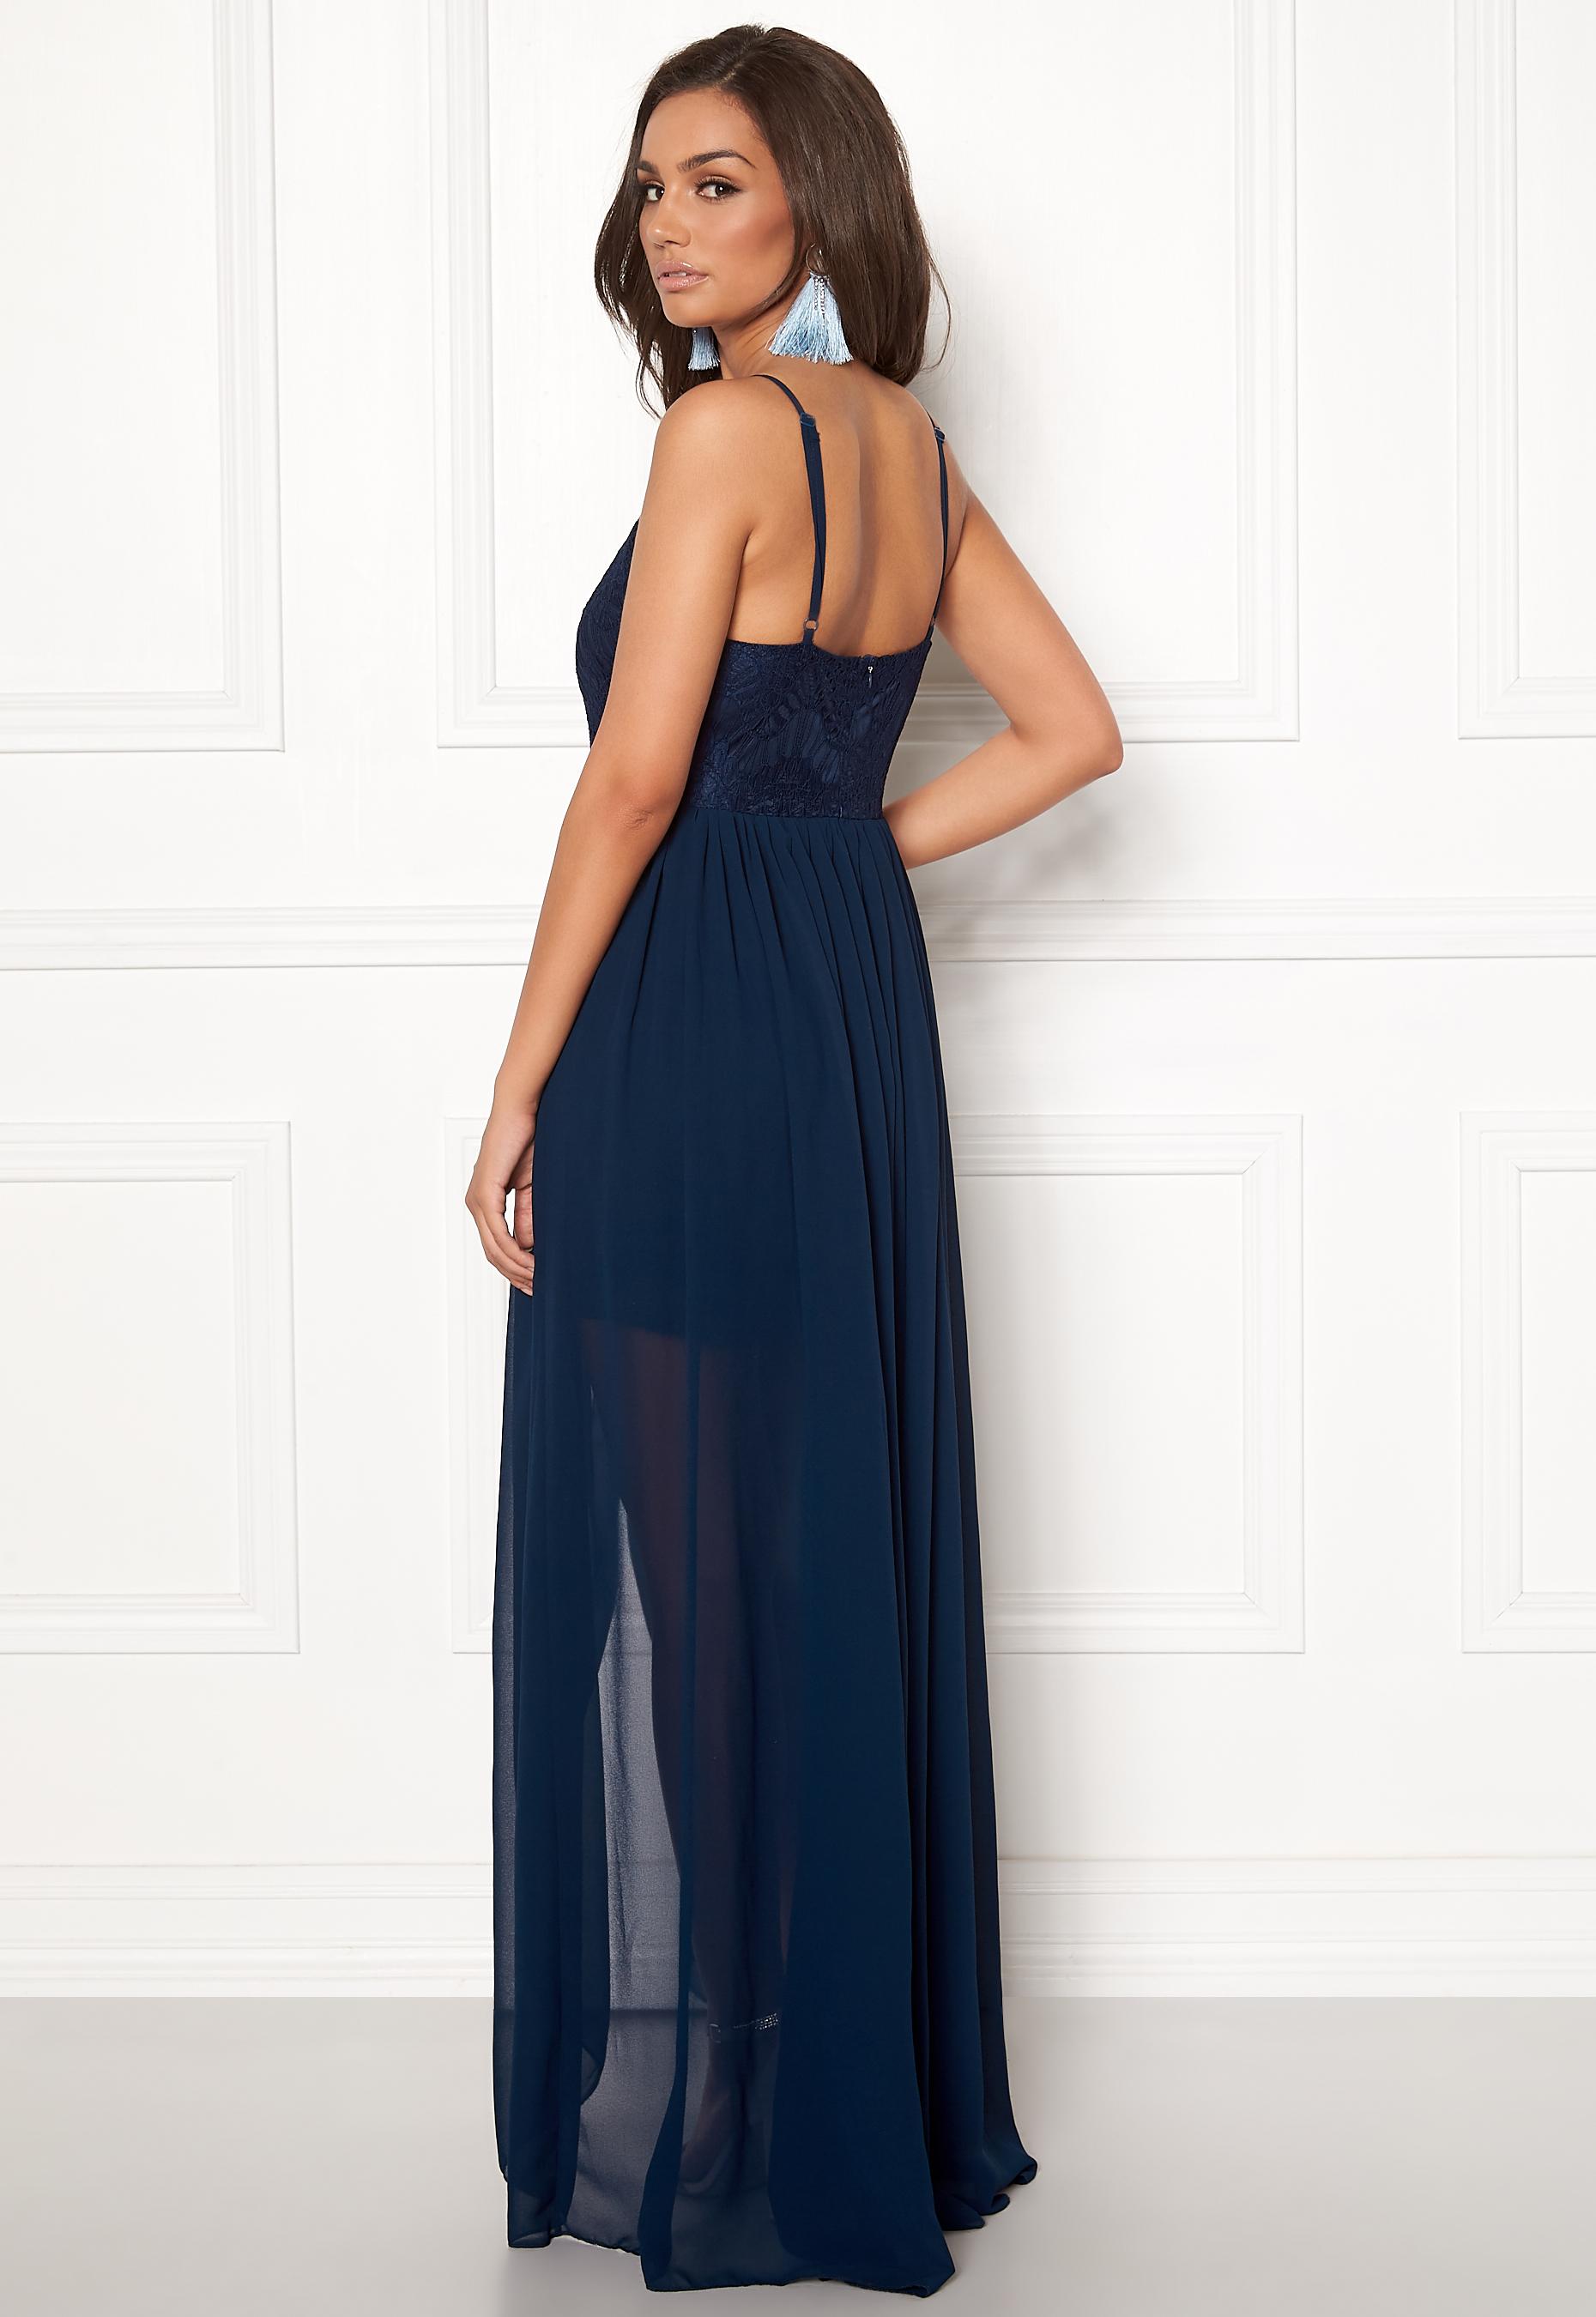 de70ee7de7b7 Girl In Mind Maddie Lace Maxi Dress Navy - Bubbleroom